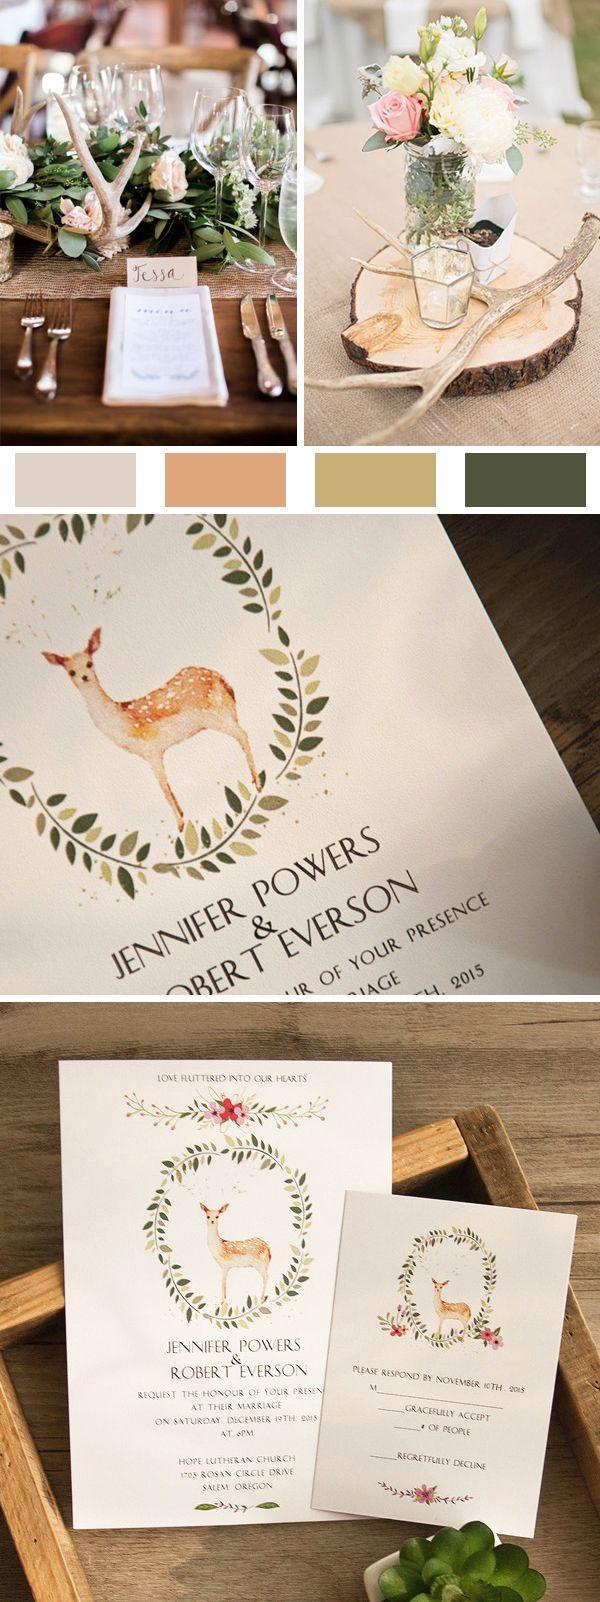 Rustic Boho Deer Wedding Invitations Ewi413 Boho Weddings And Wedding